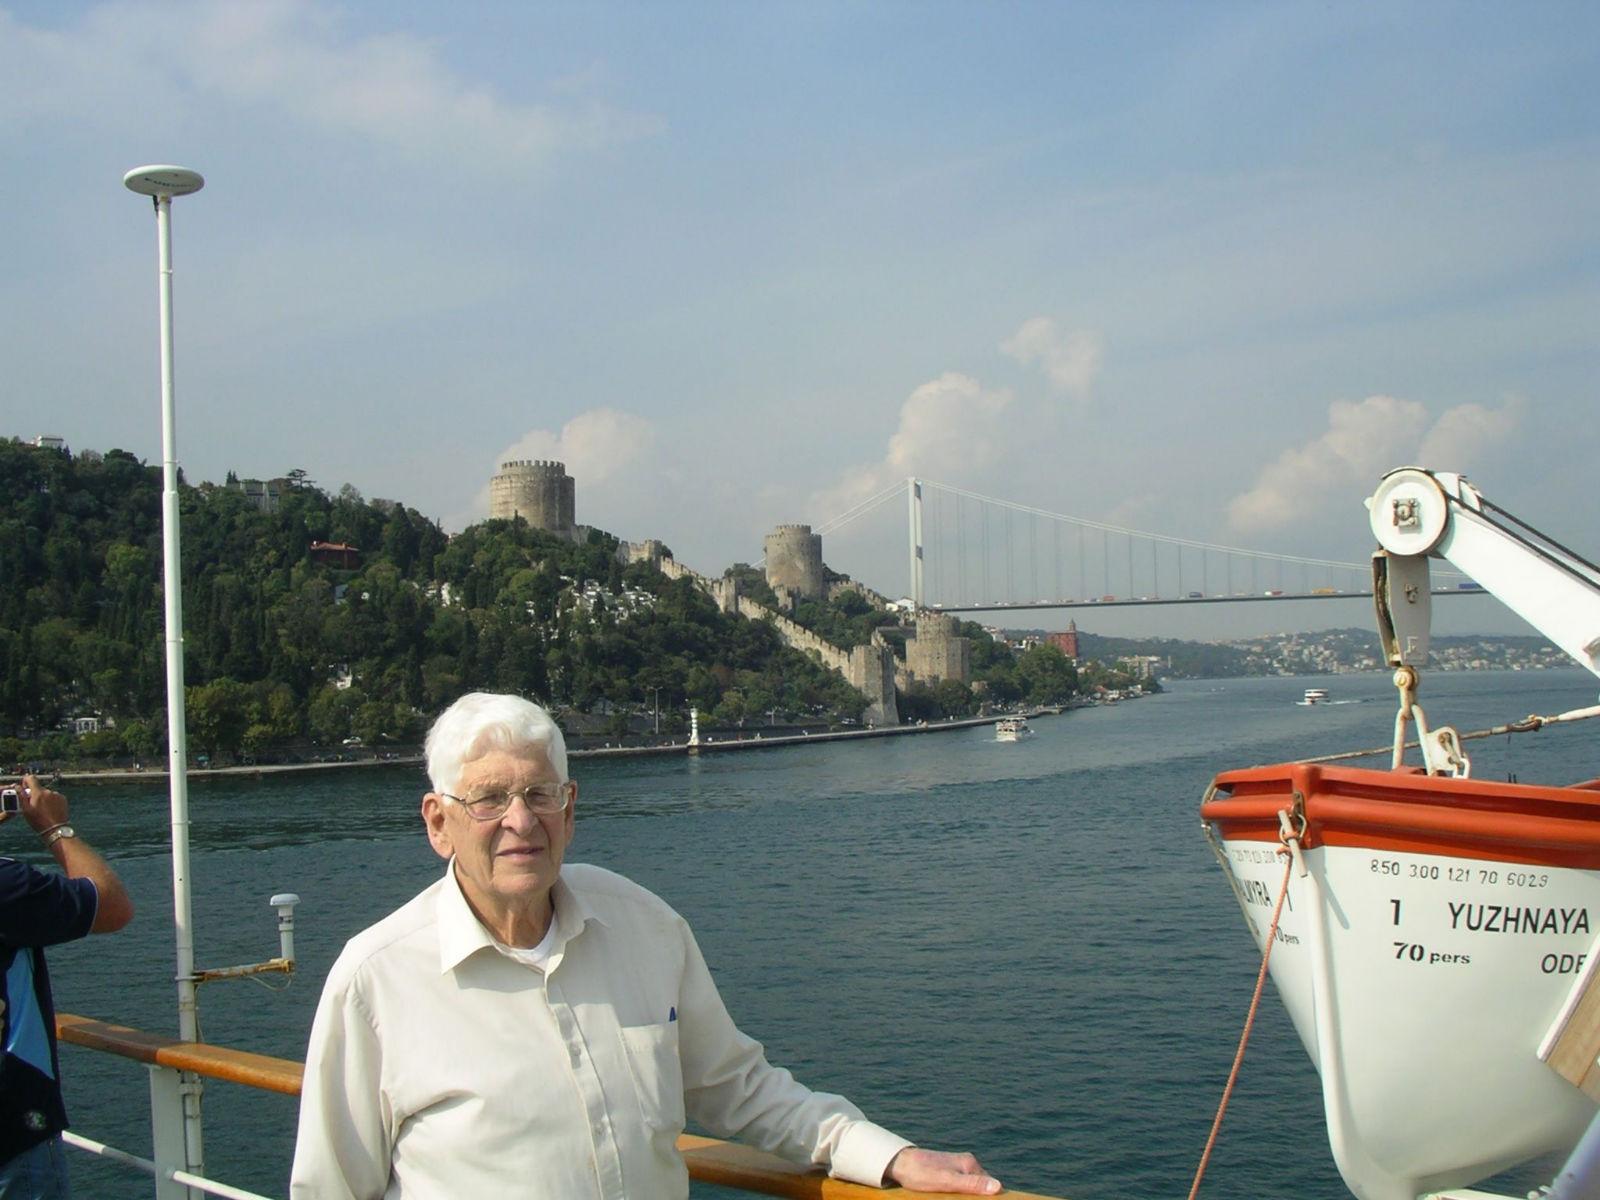 Felix Heidenstam - ferry from Odessa to Istanbul, across the Black Sea, 2006